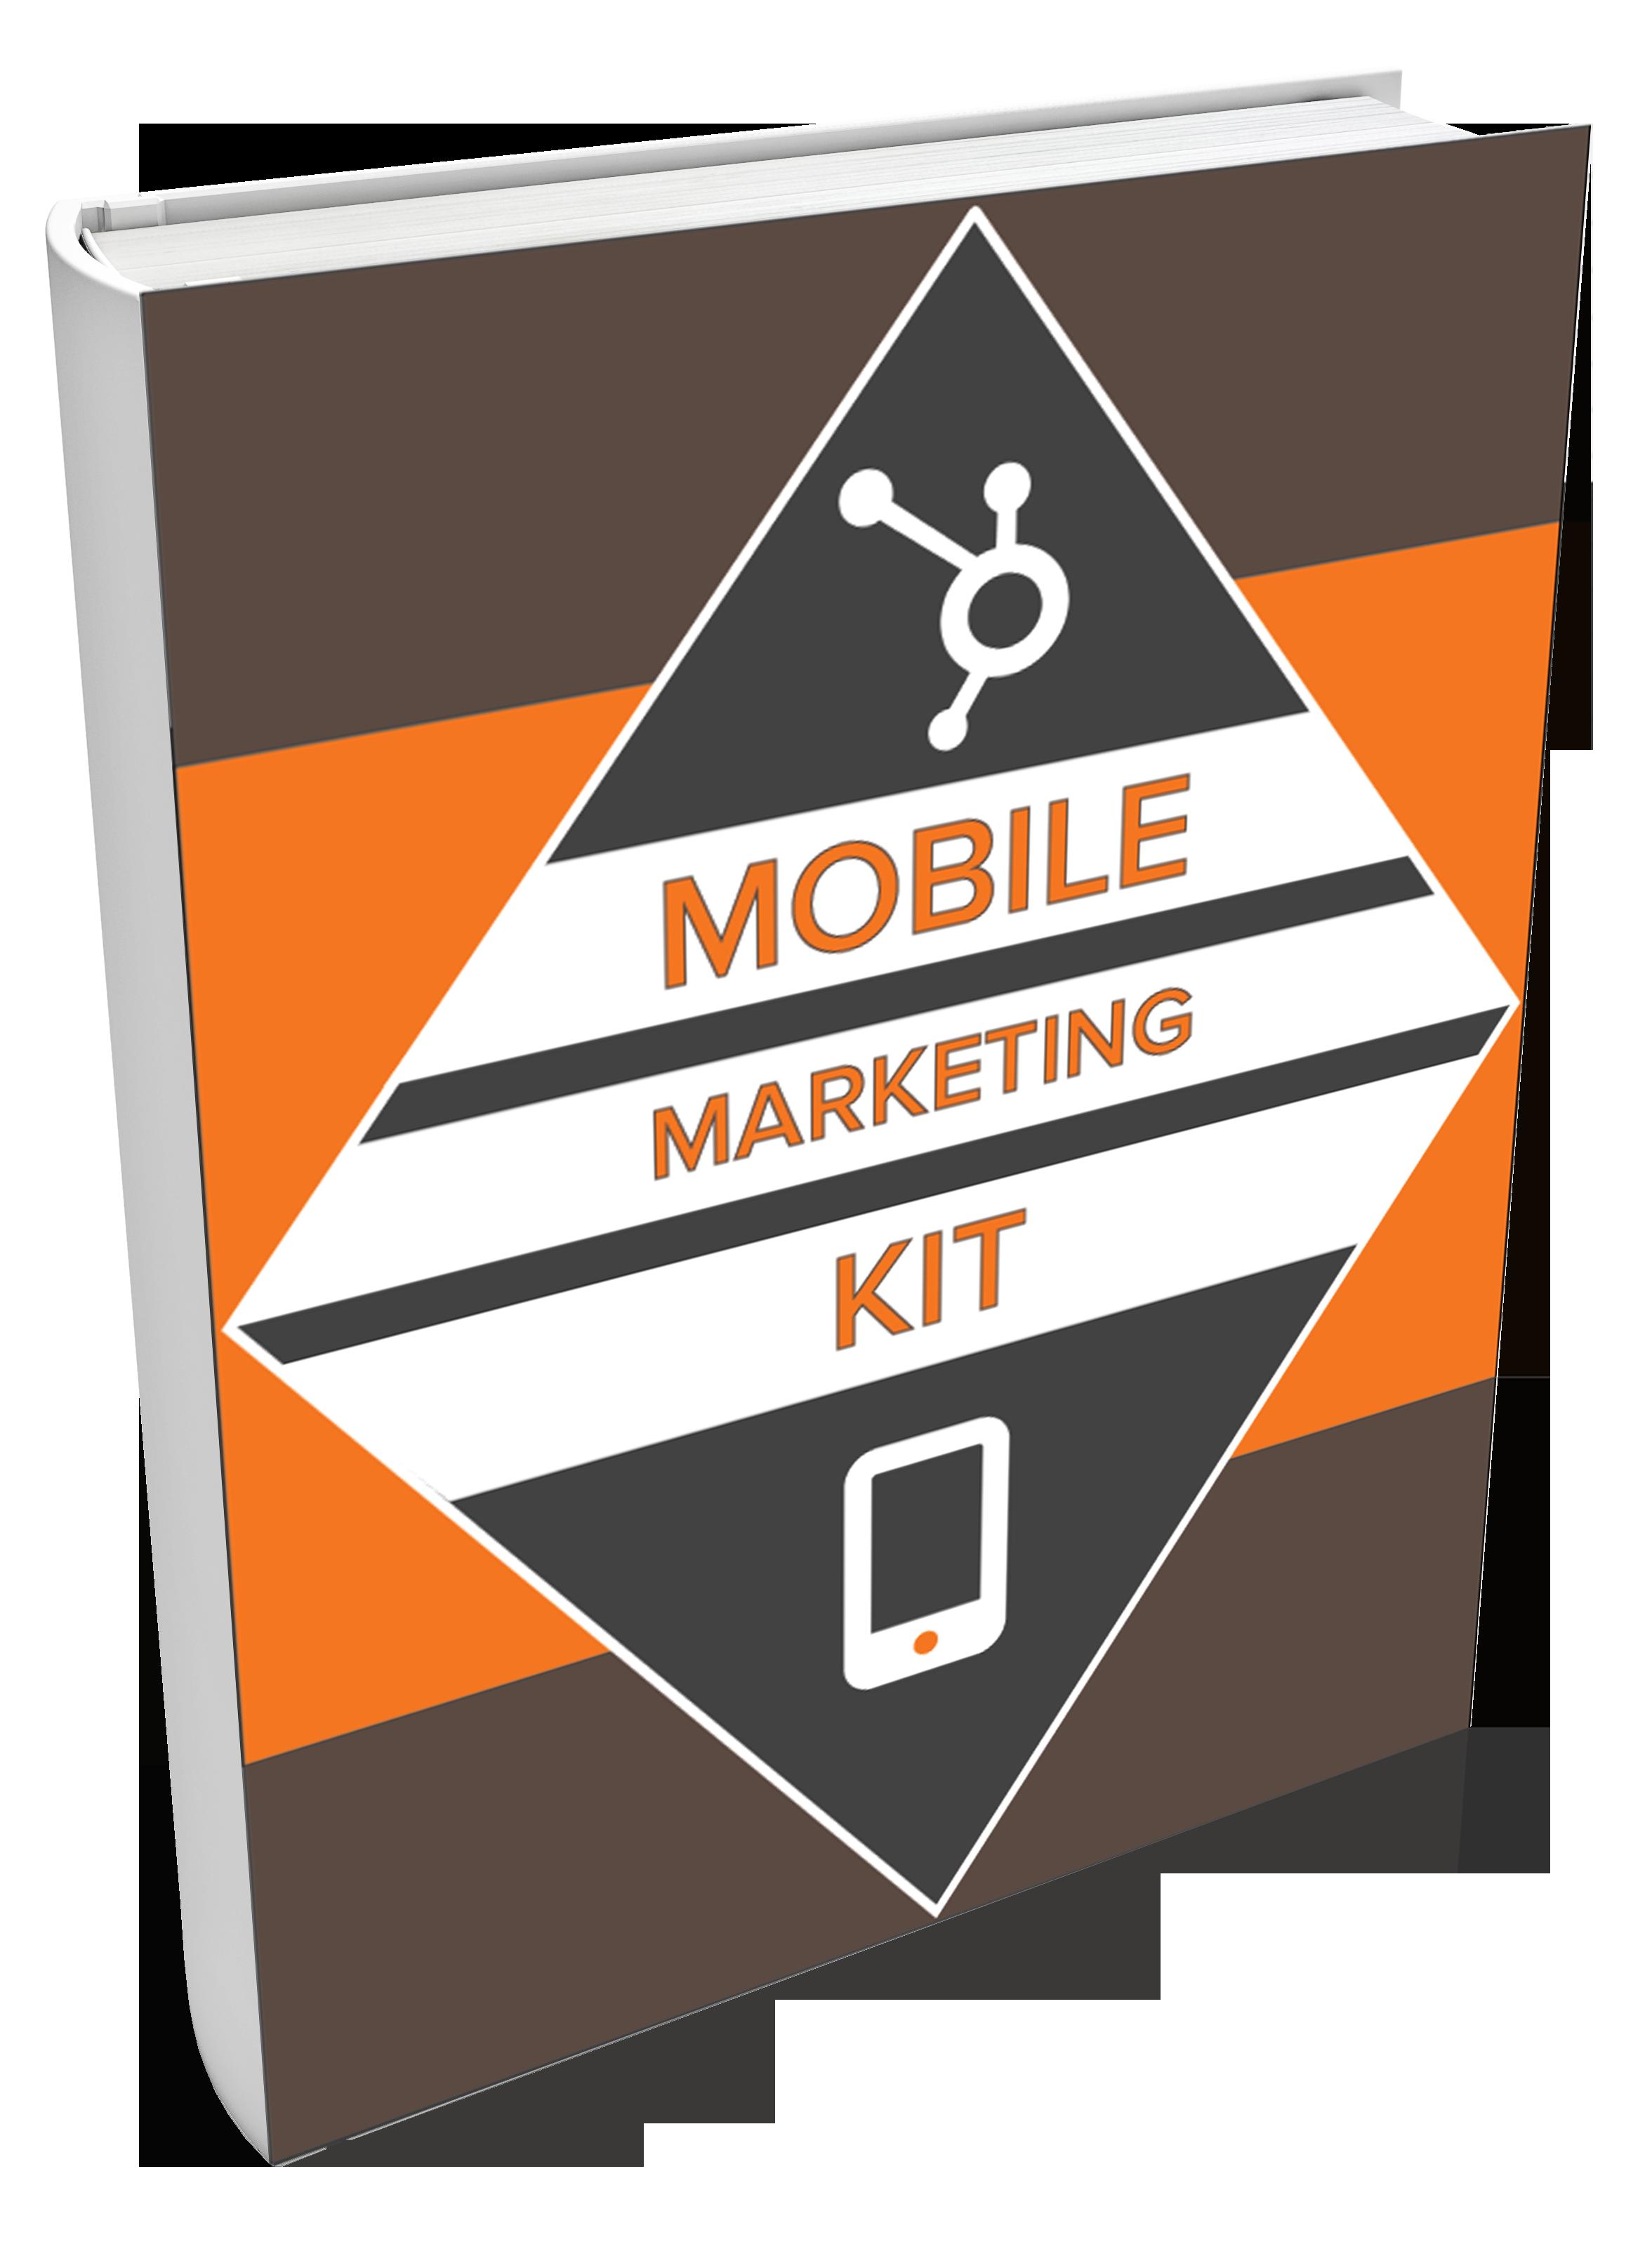 Mobile Marketing Kit